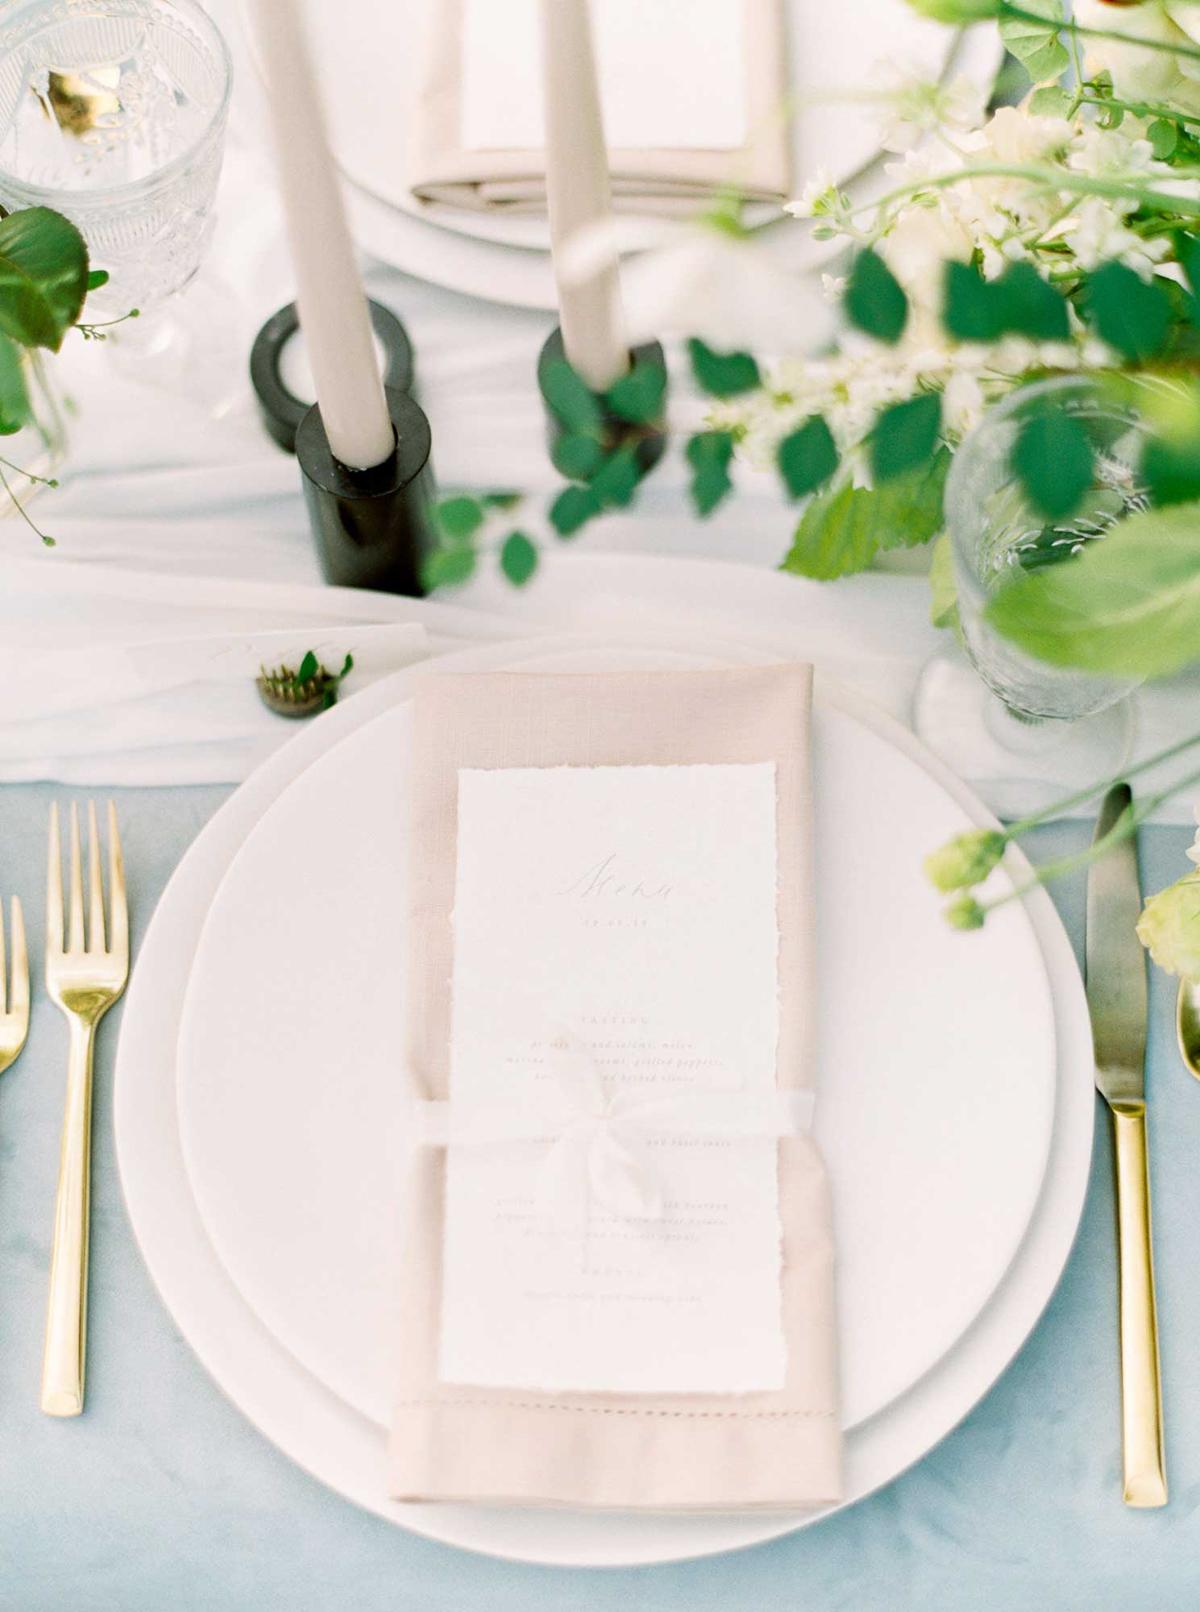 kayla-yestal-vineyard-bride-swish-list-woodland-weddings-niagara-wedding-editorial-54.jpg